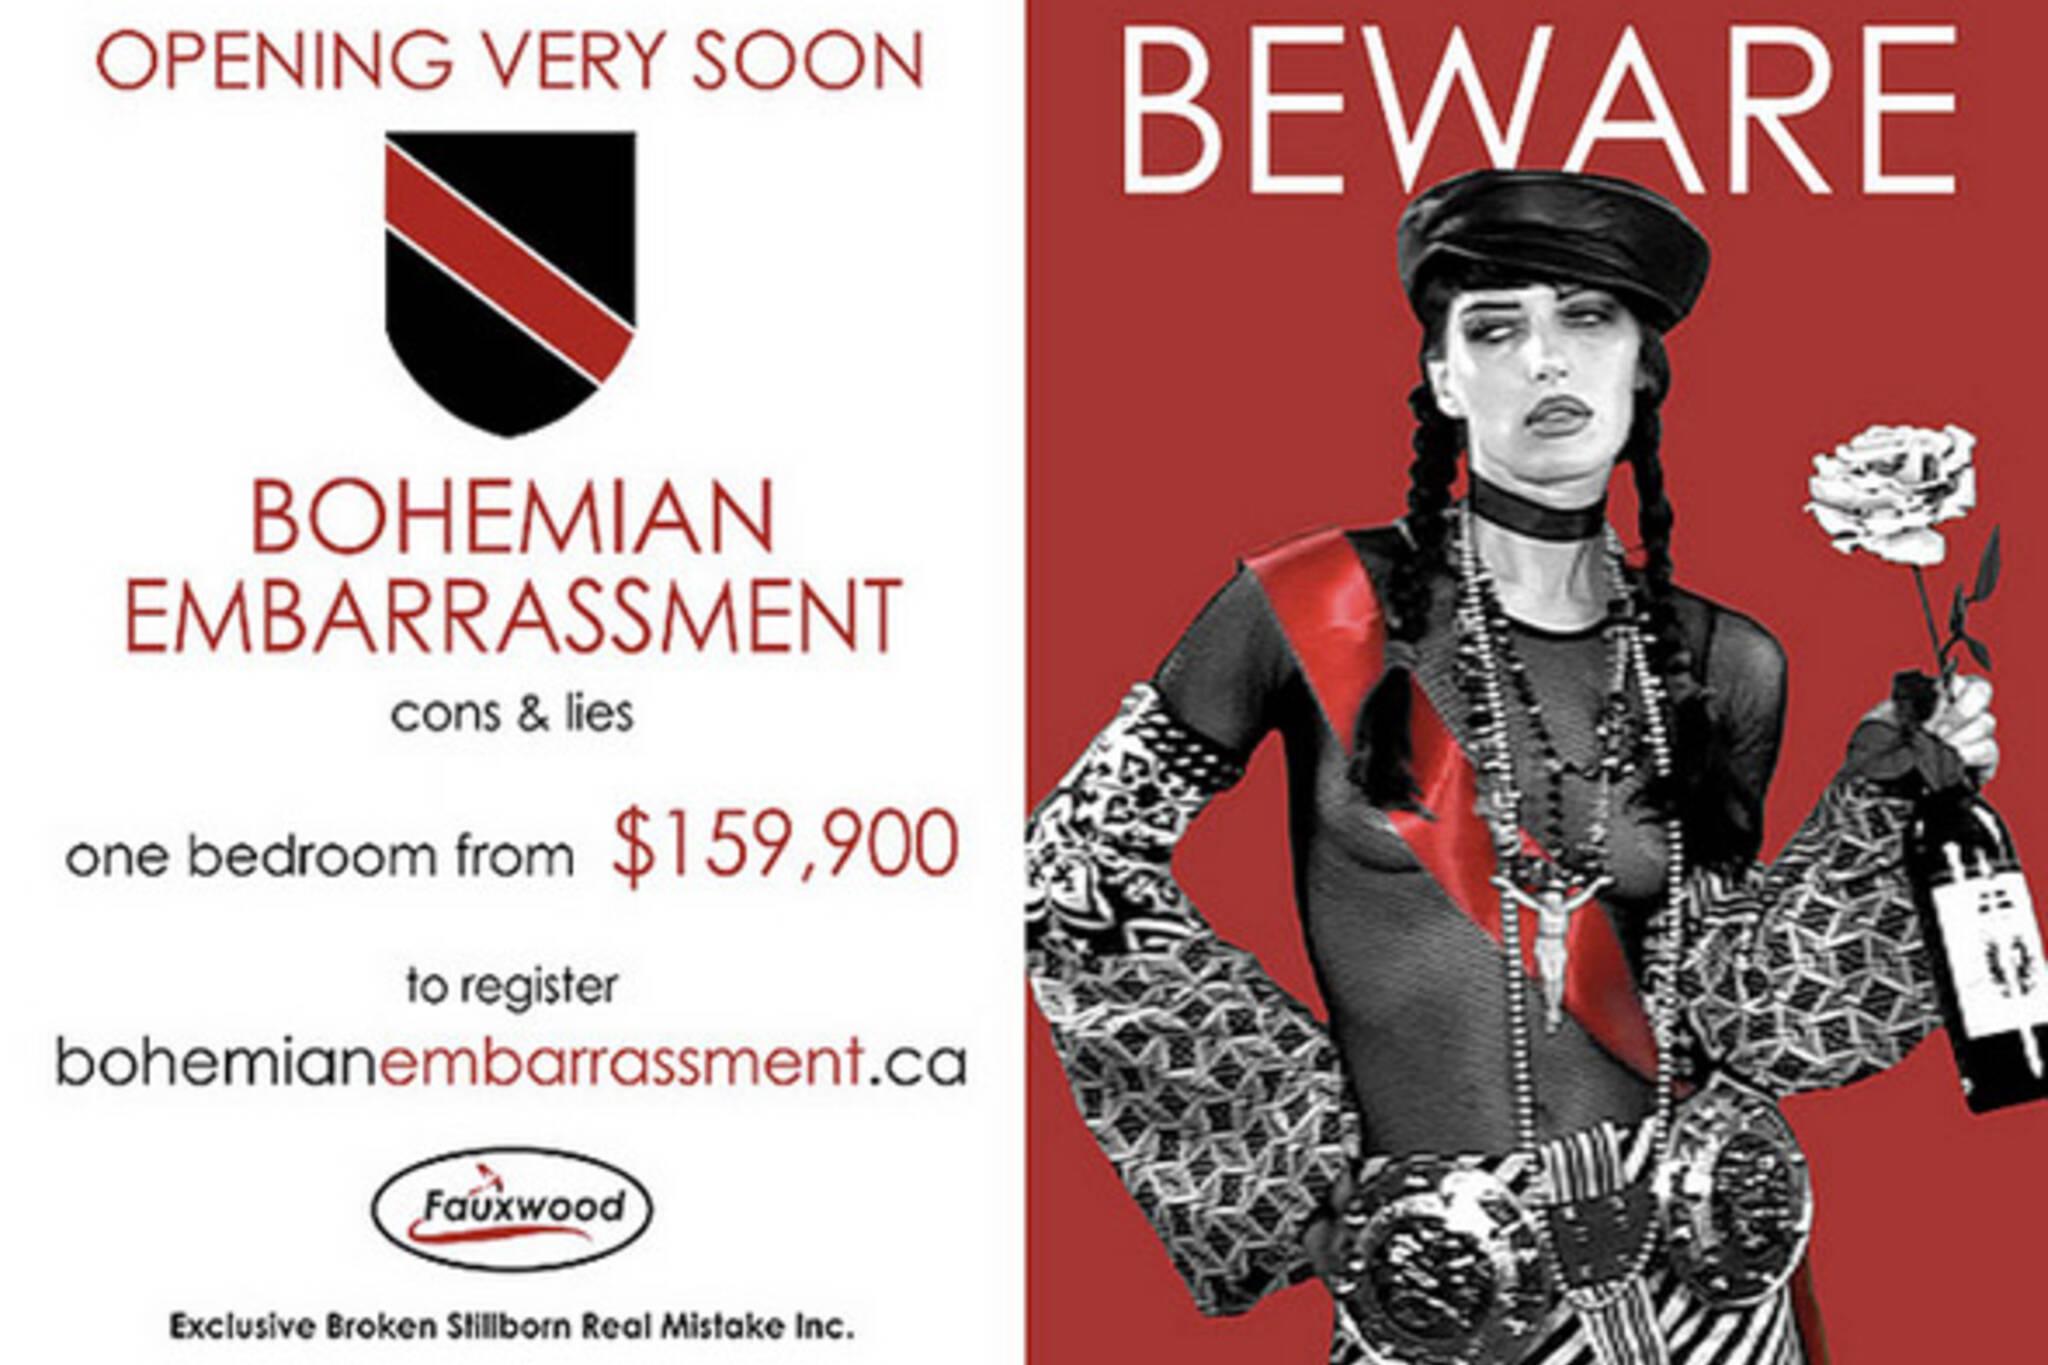 Bohemian Embassy Toronto